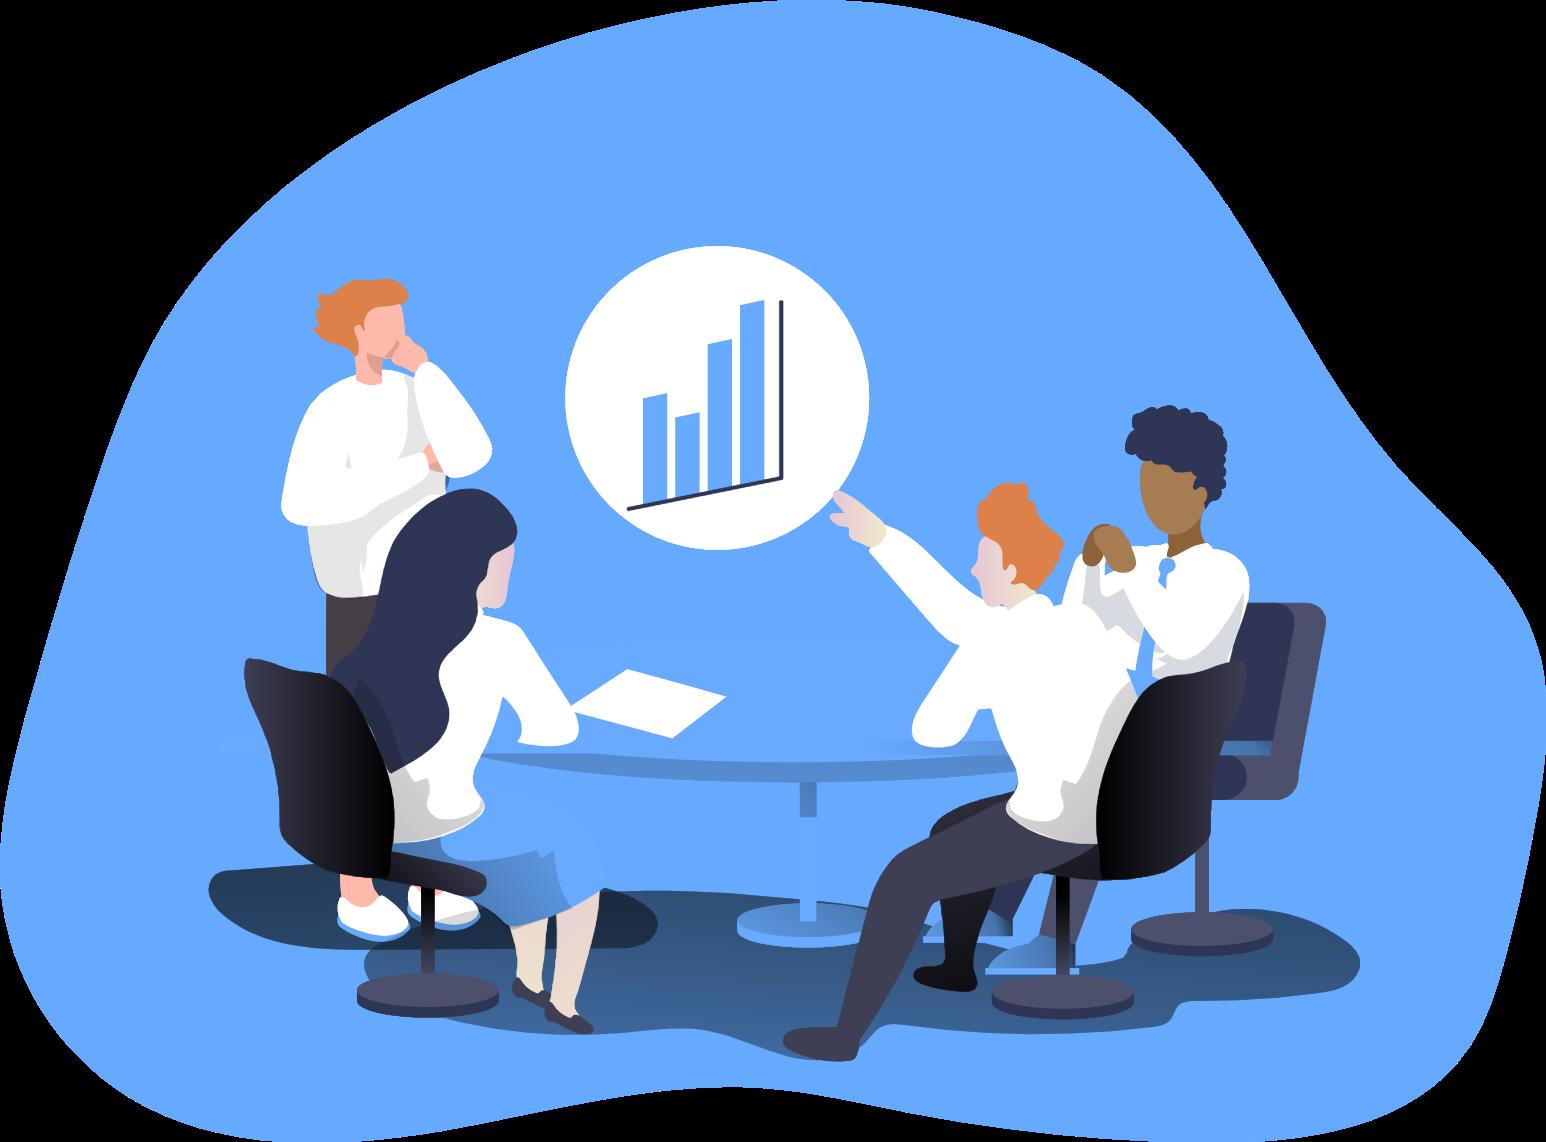 Image for part: Digital Marketer Job description